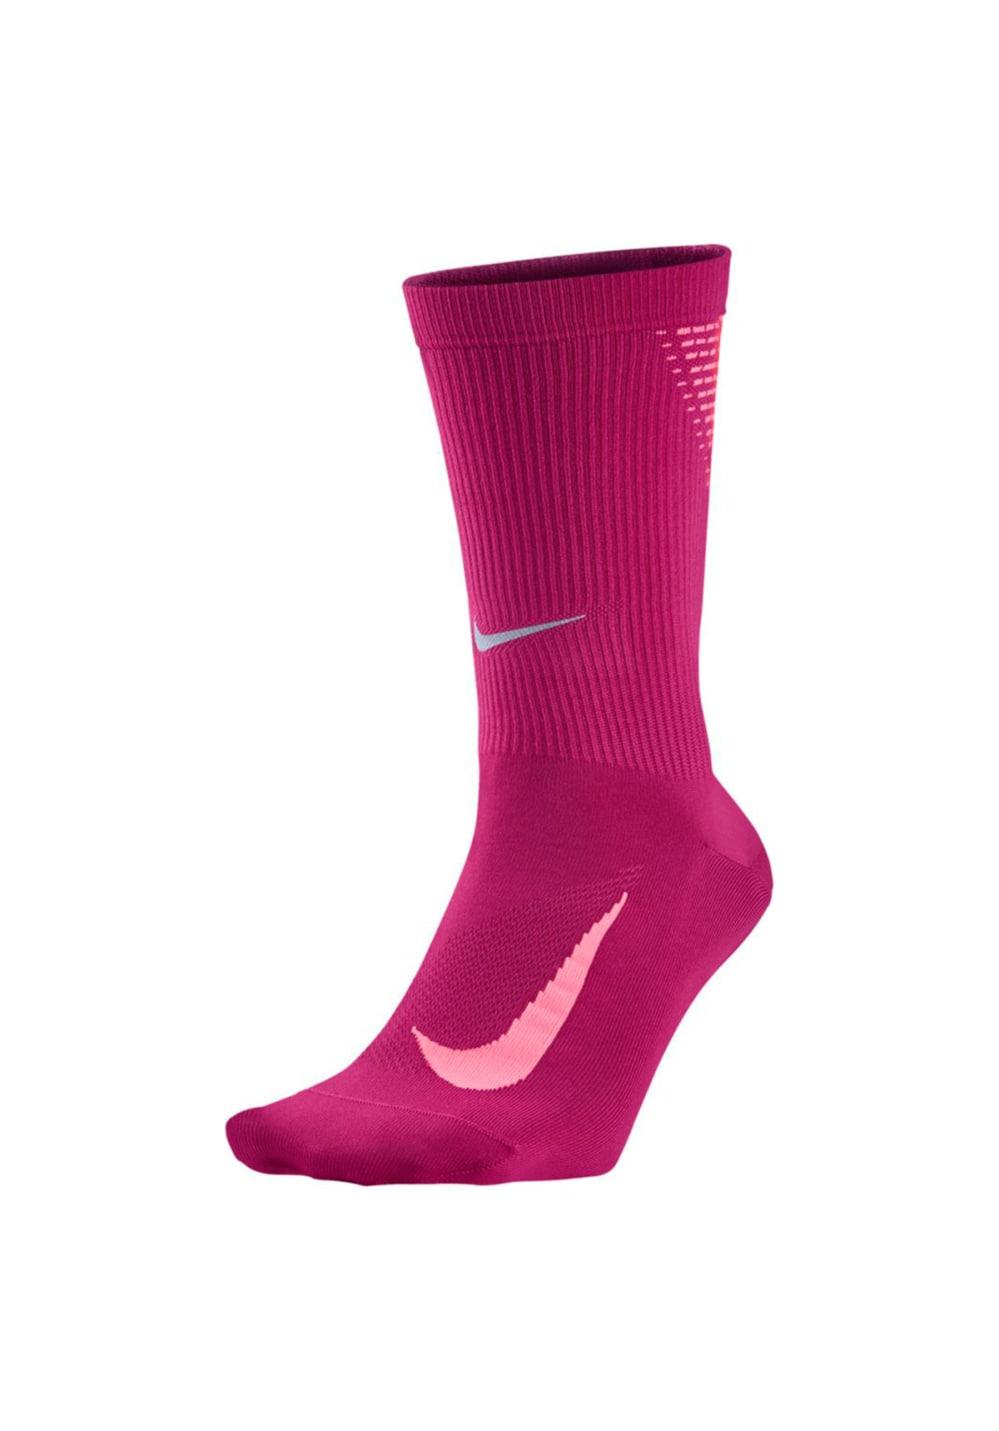 code promo 2bb73 d1d91 Nike Elite Lightweight Crew Running Socks - Chaussettes running - Rose